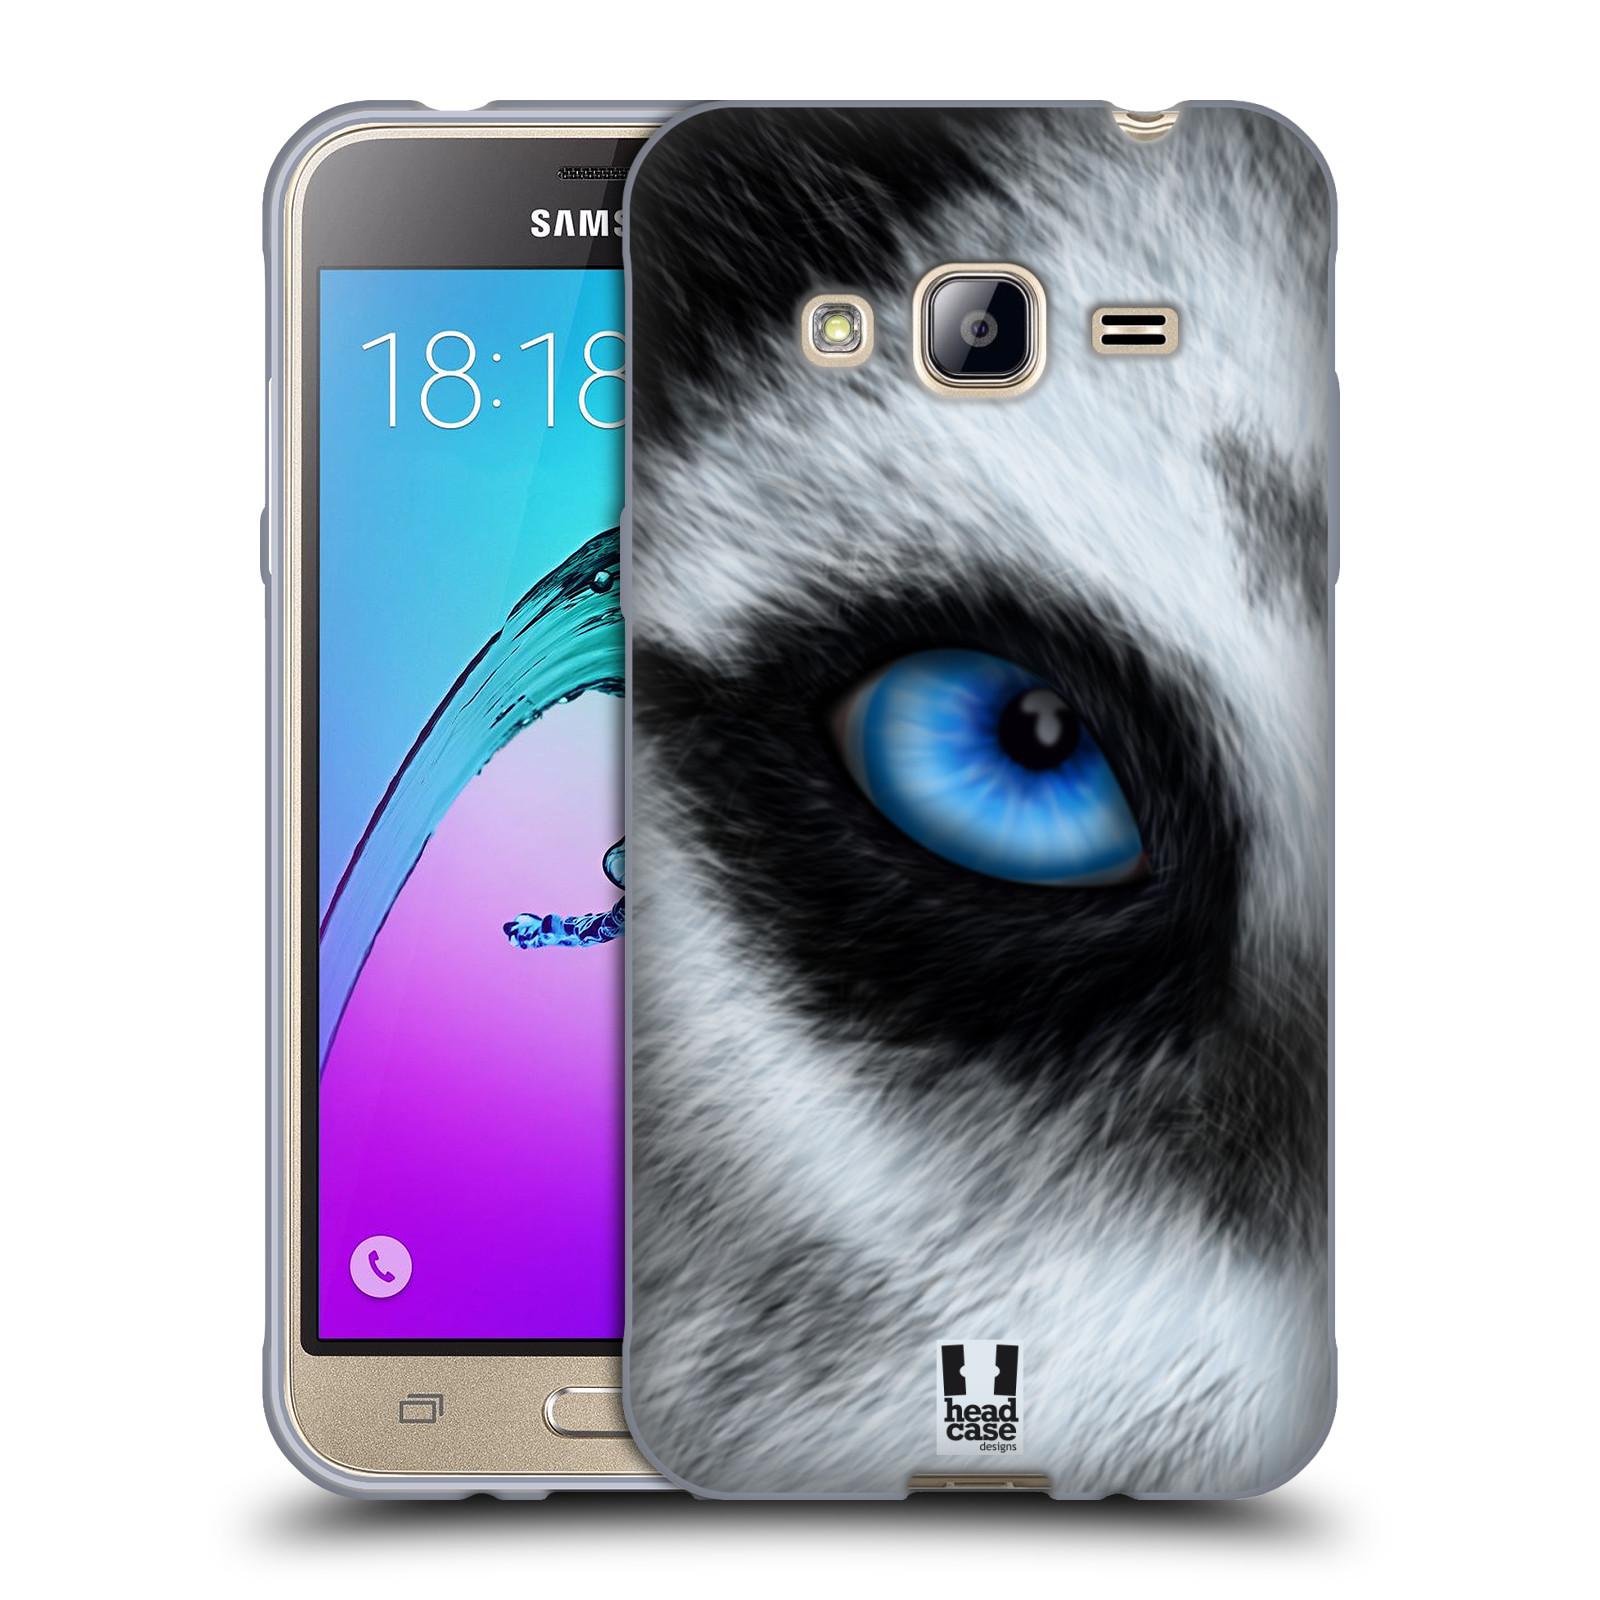 HEAD CASE silikonový obal na mobil Samsung Galaxy J3, J3 2016 vzor pohled zvířete oko pes husky